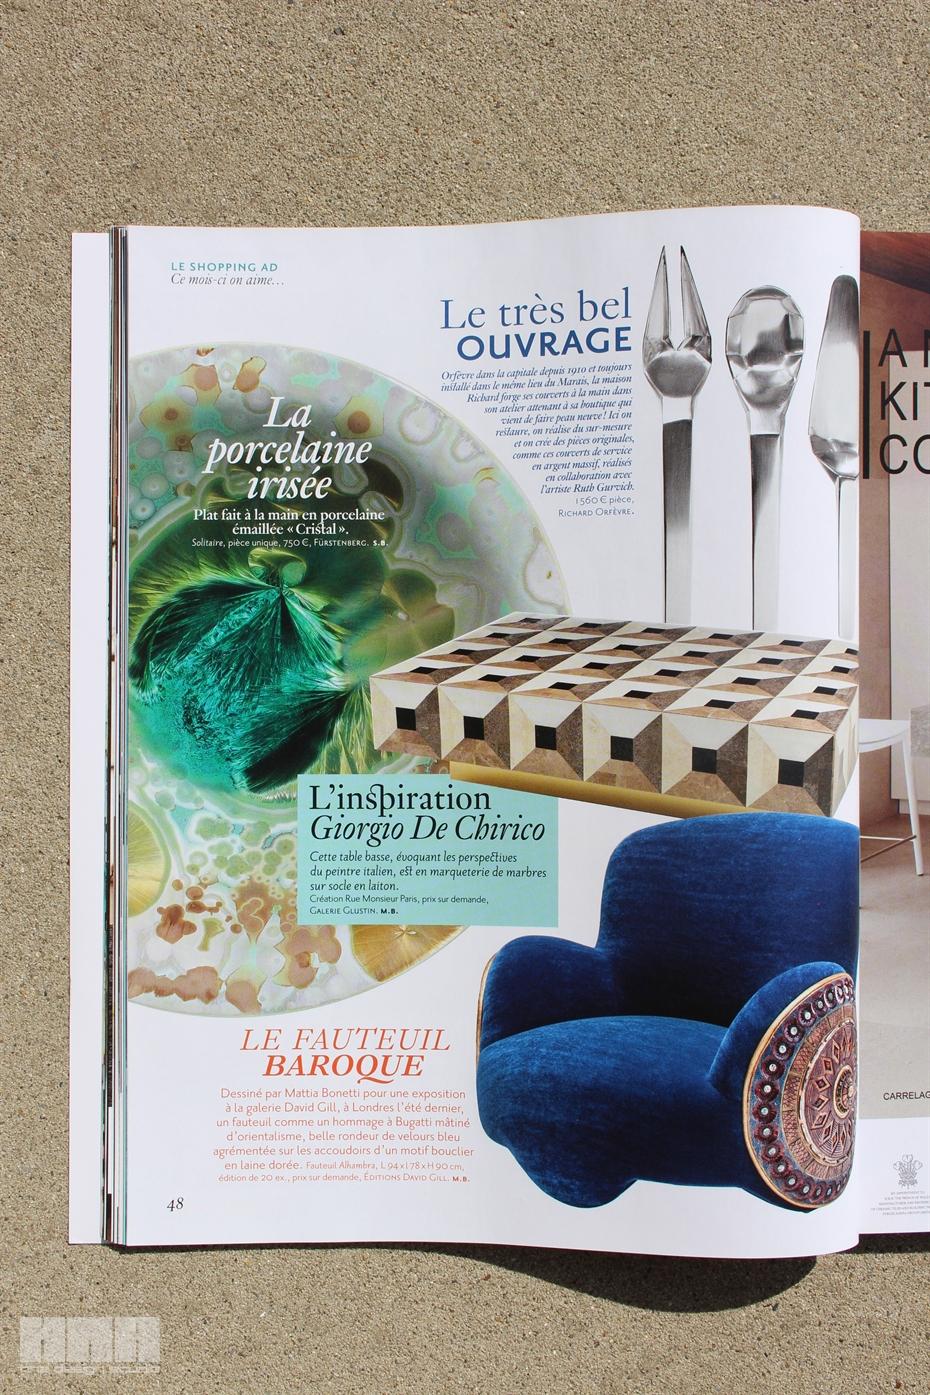 hna inspiralo magazinok ad 14